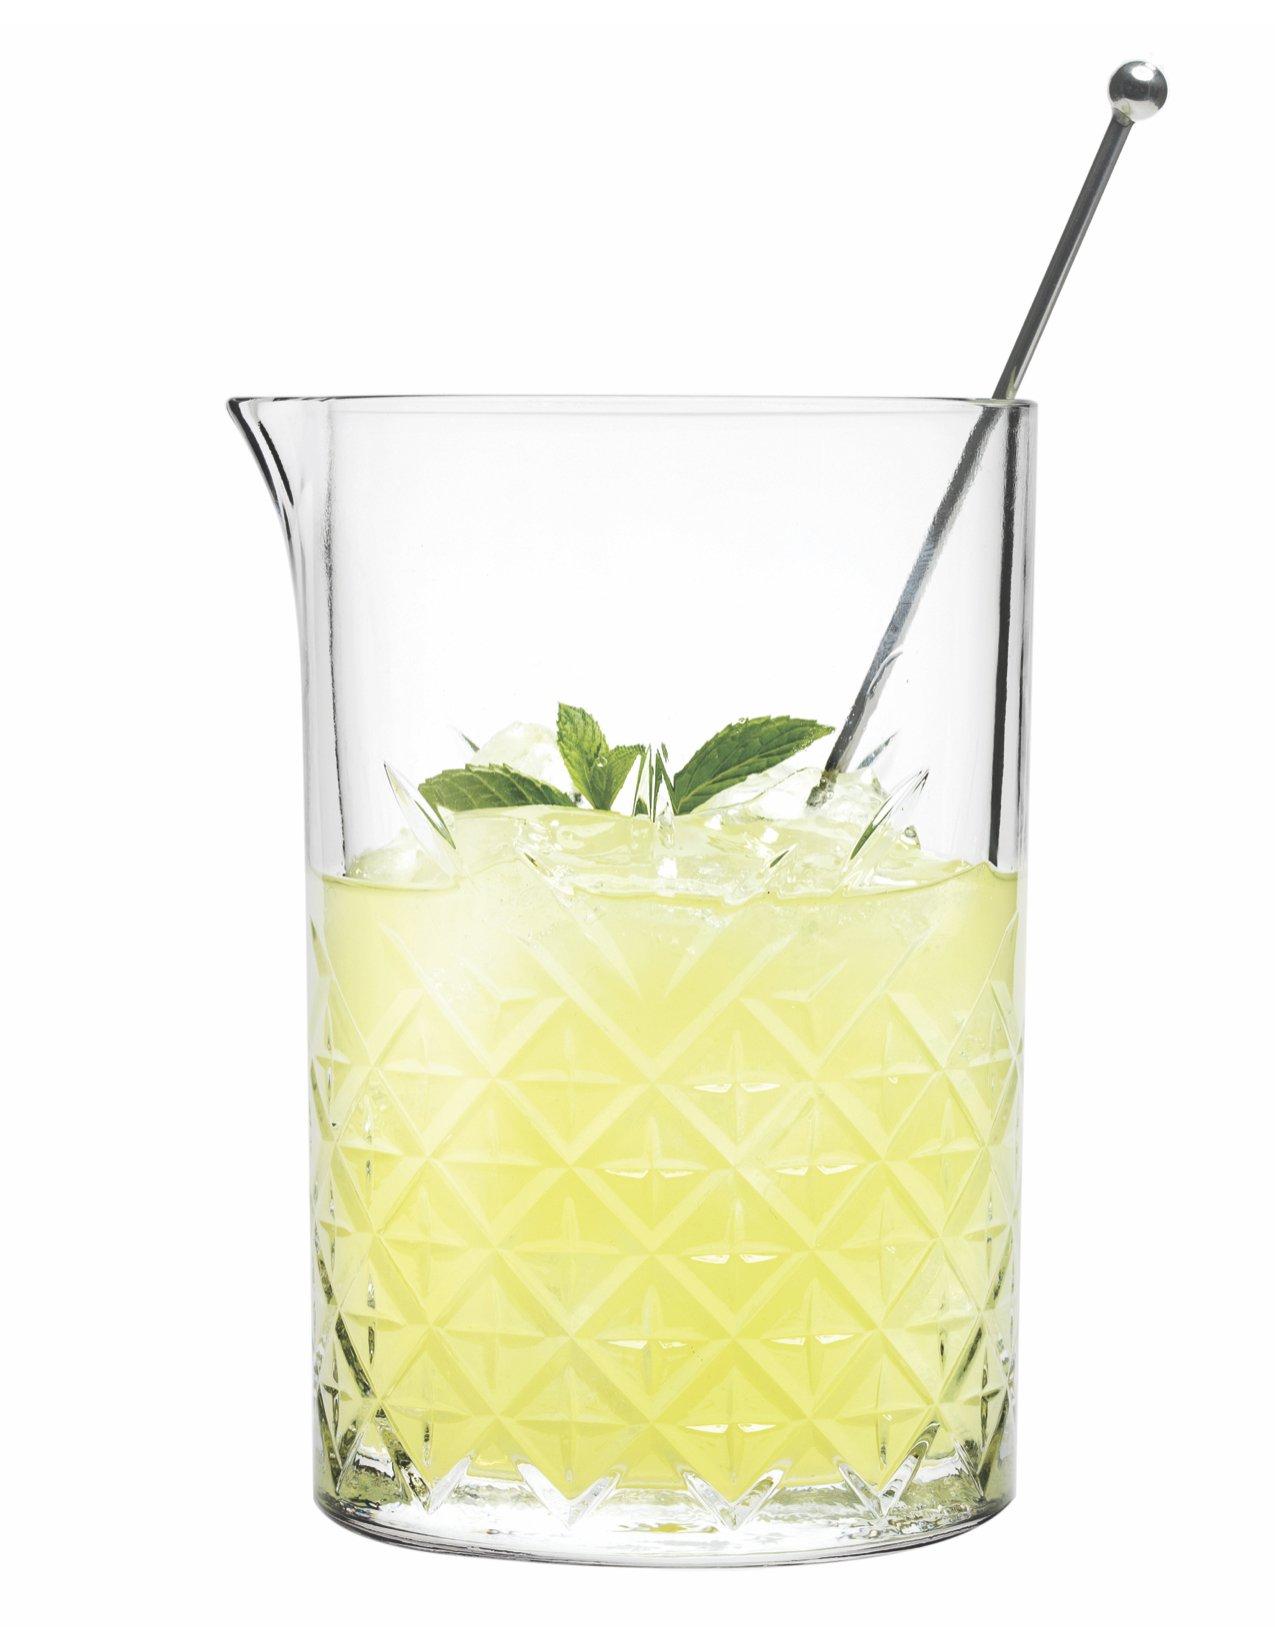 Hospitality Glass Brands 52849-006 Timeless Mixing Beaker, 24.25 oz. (Pack of 6)